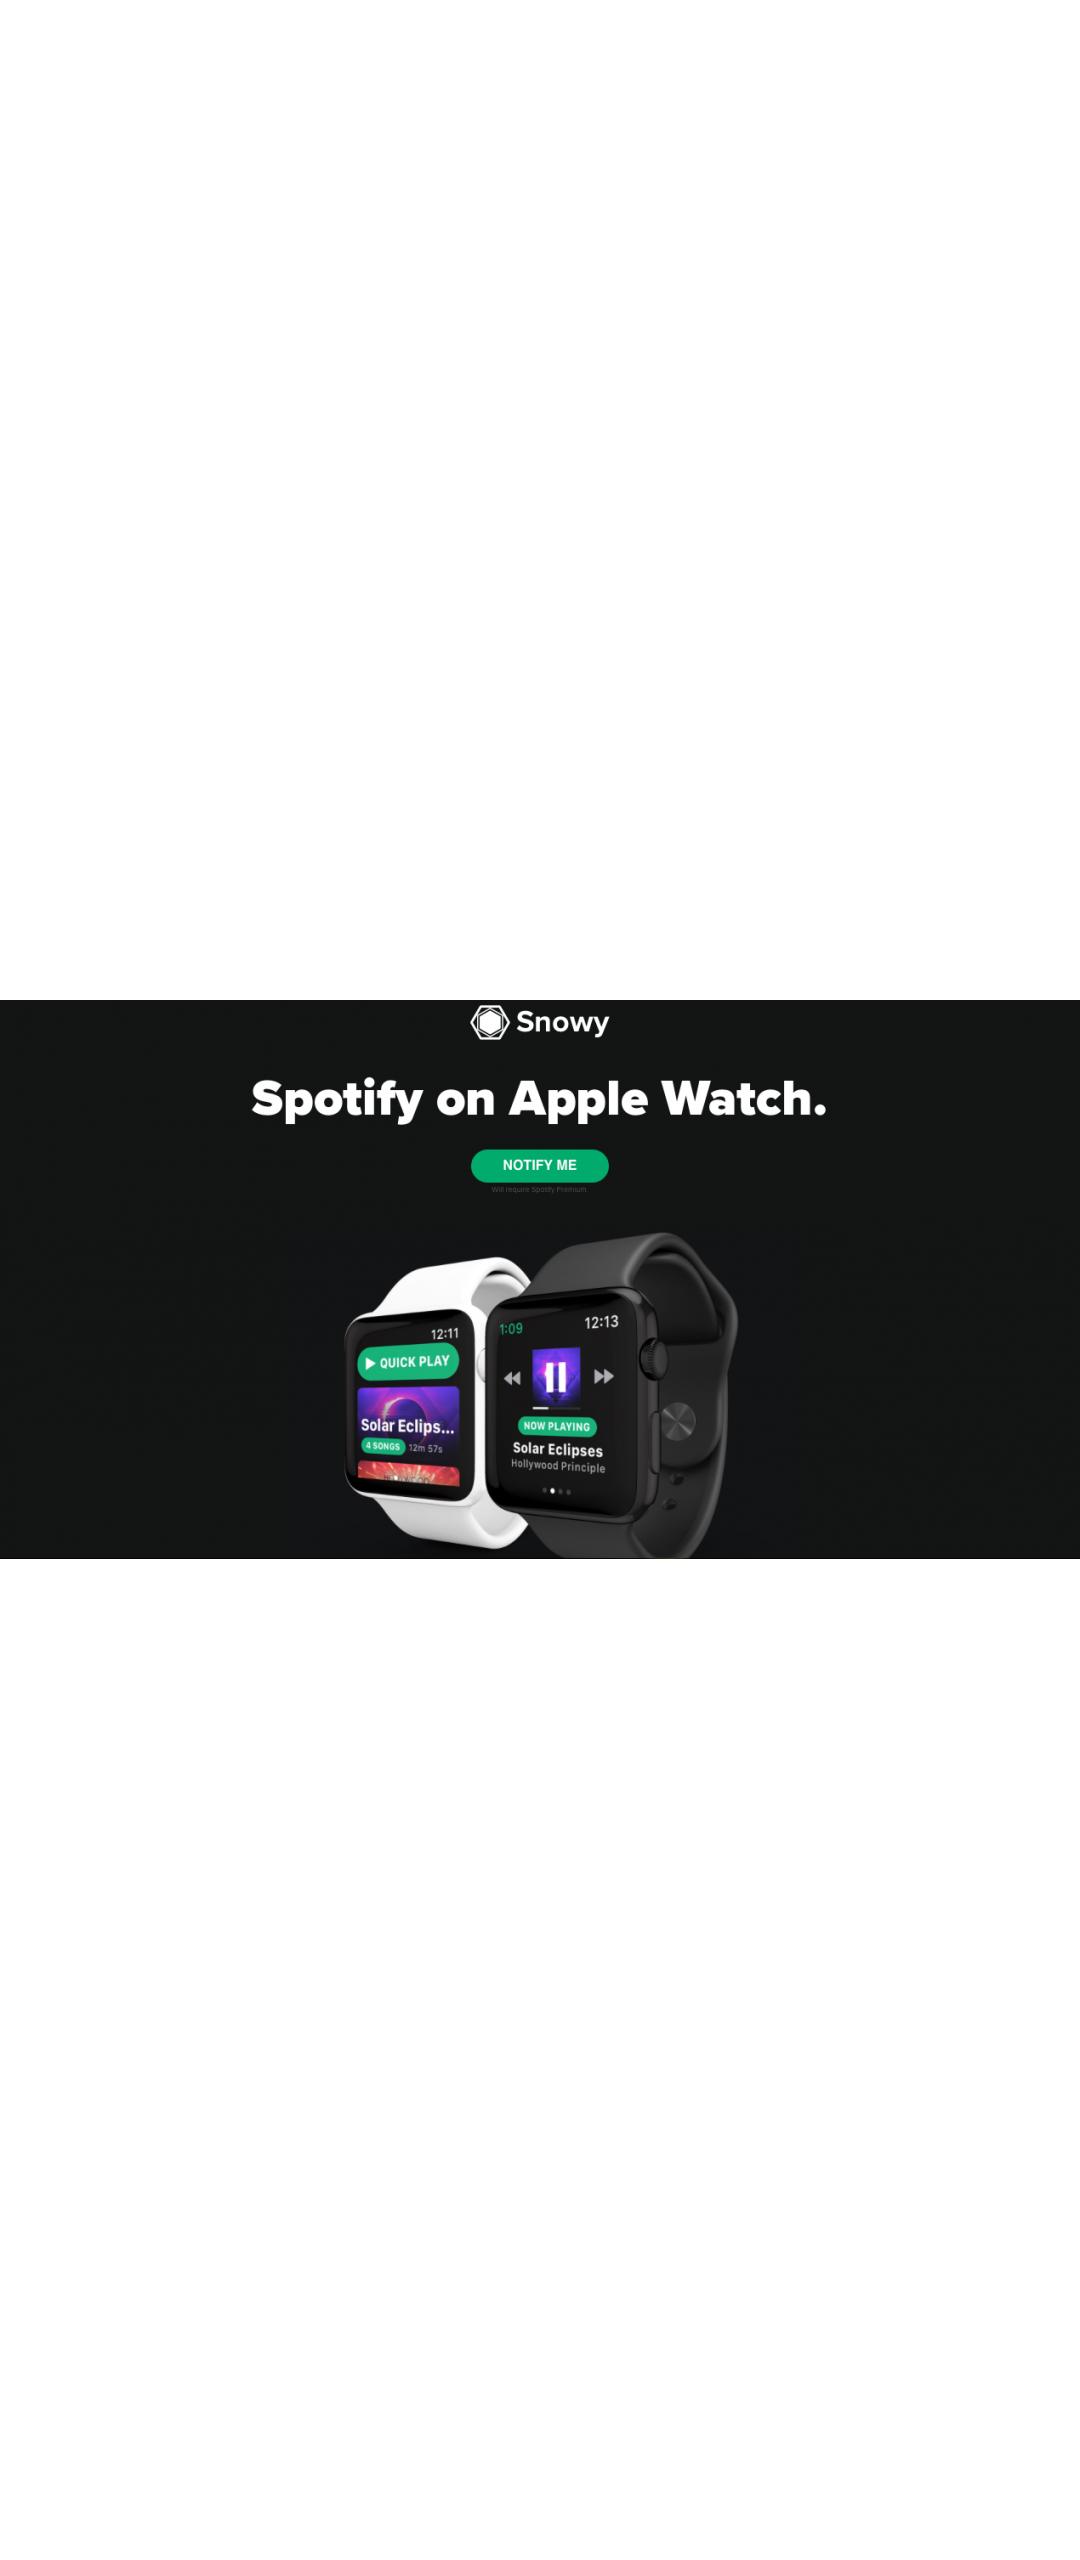 Va a salir Spotify para el Apple Watch